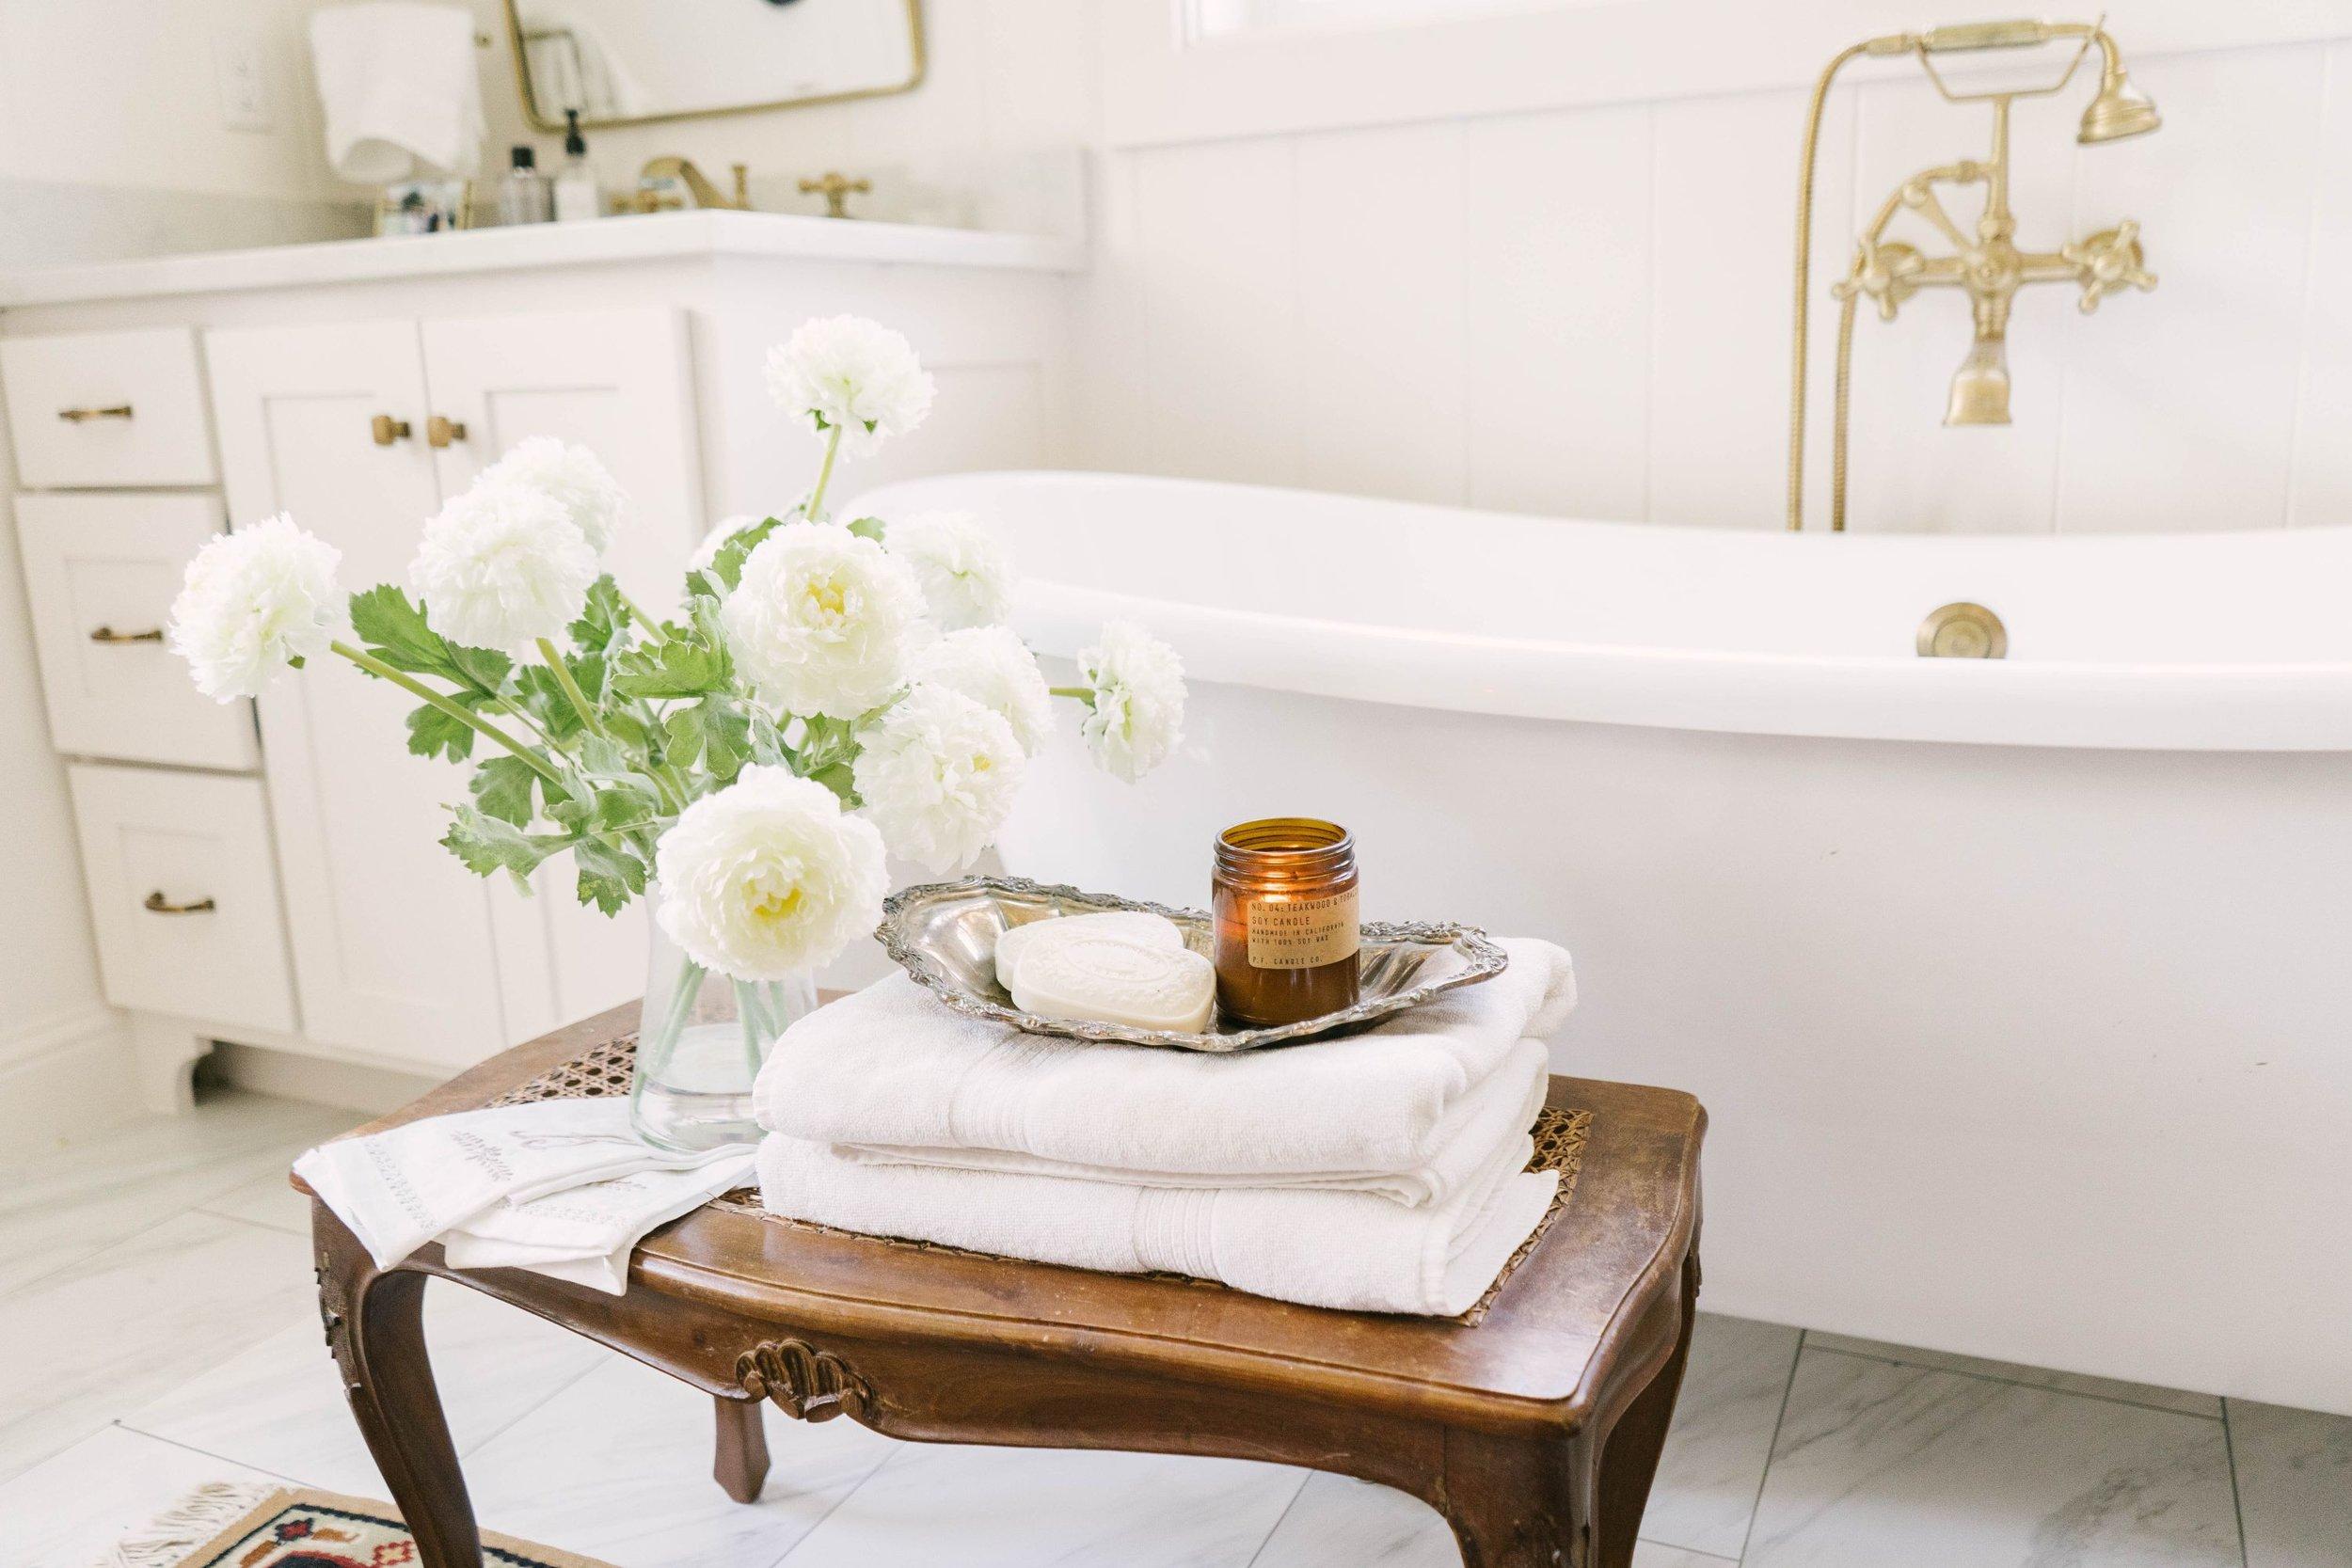 Classic Farmhouse Home Tour - Gold and White Bathroom - Clawfoot Tub